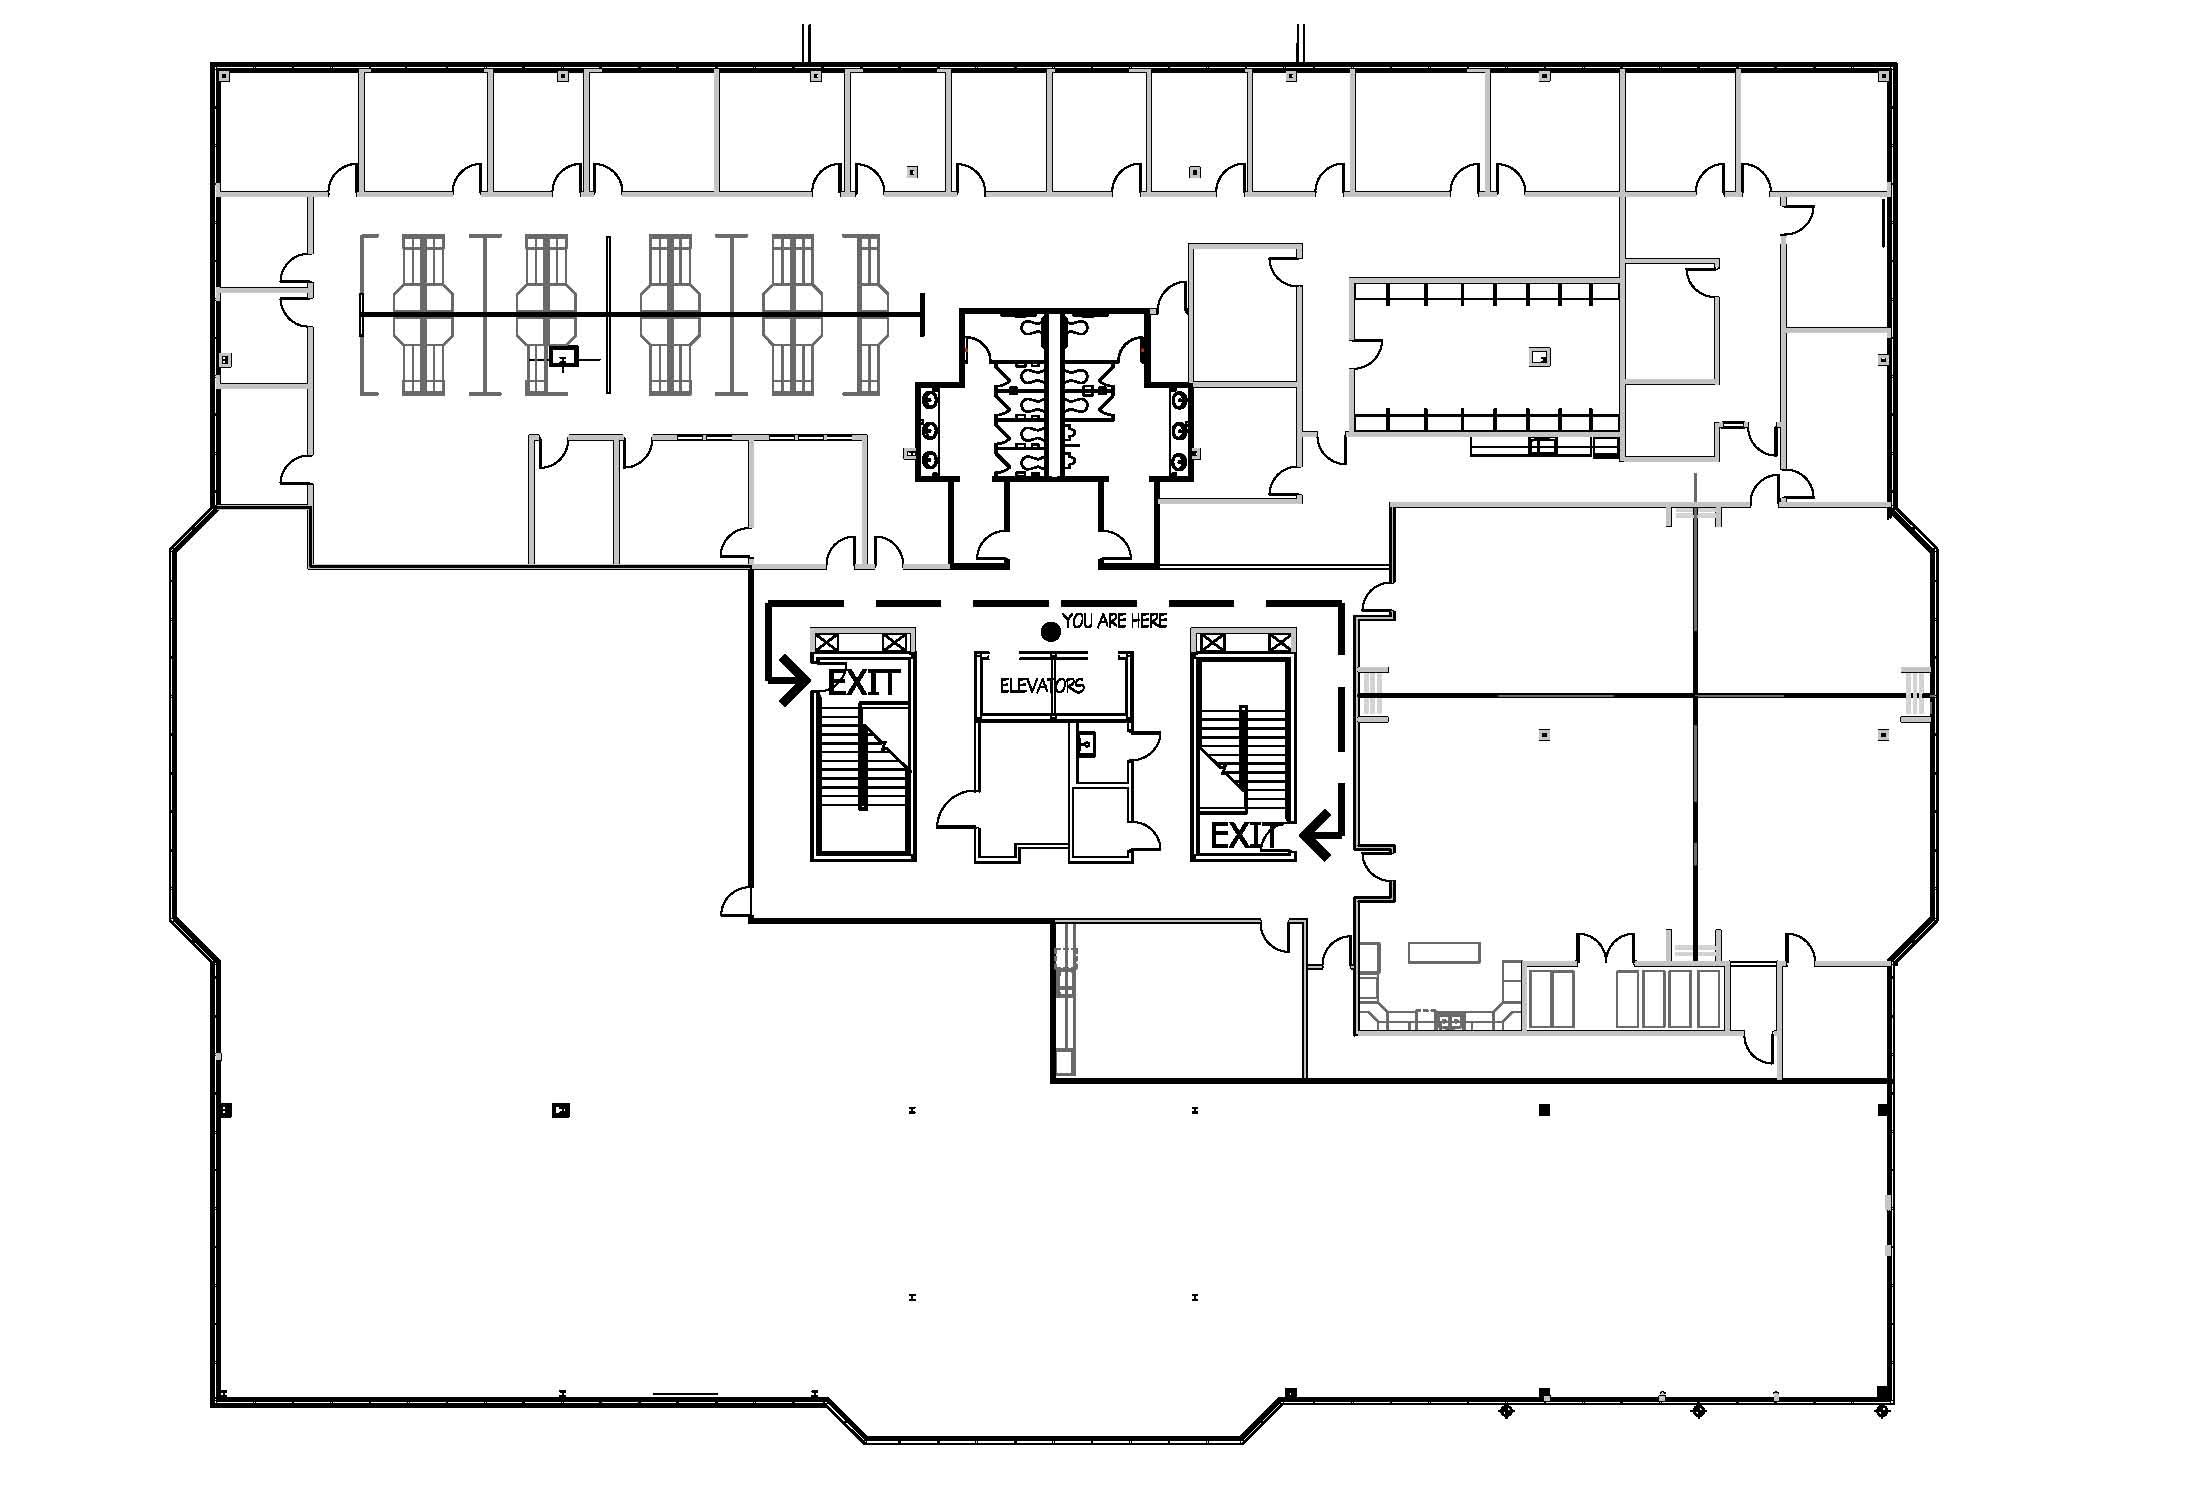 200 floor plan.jpg